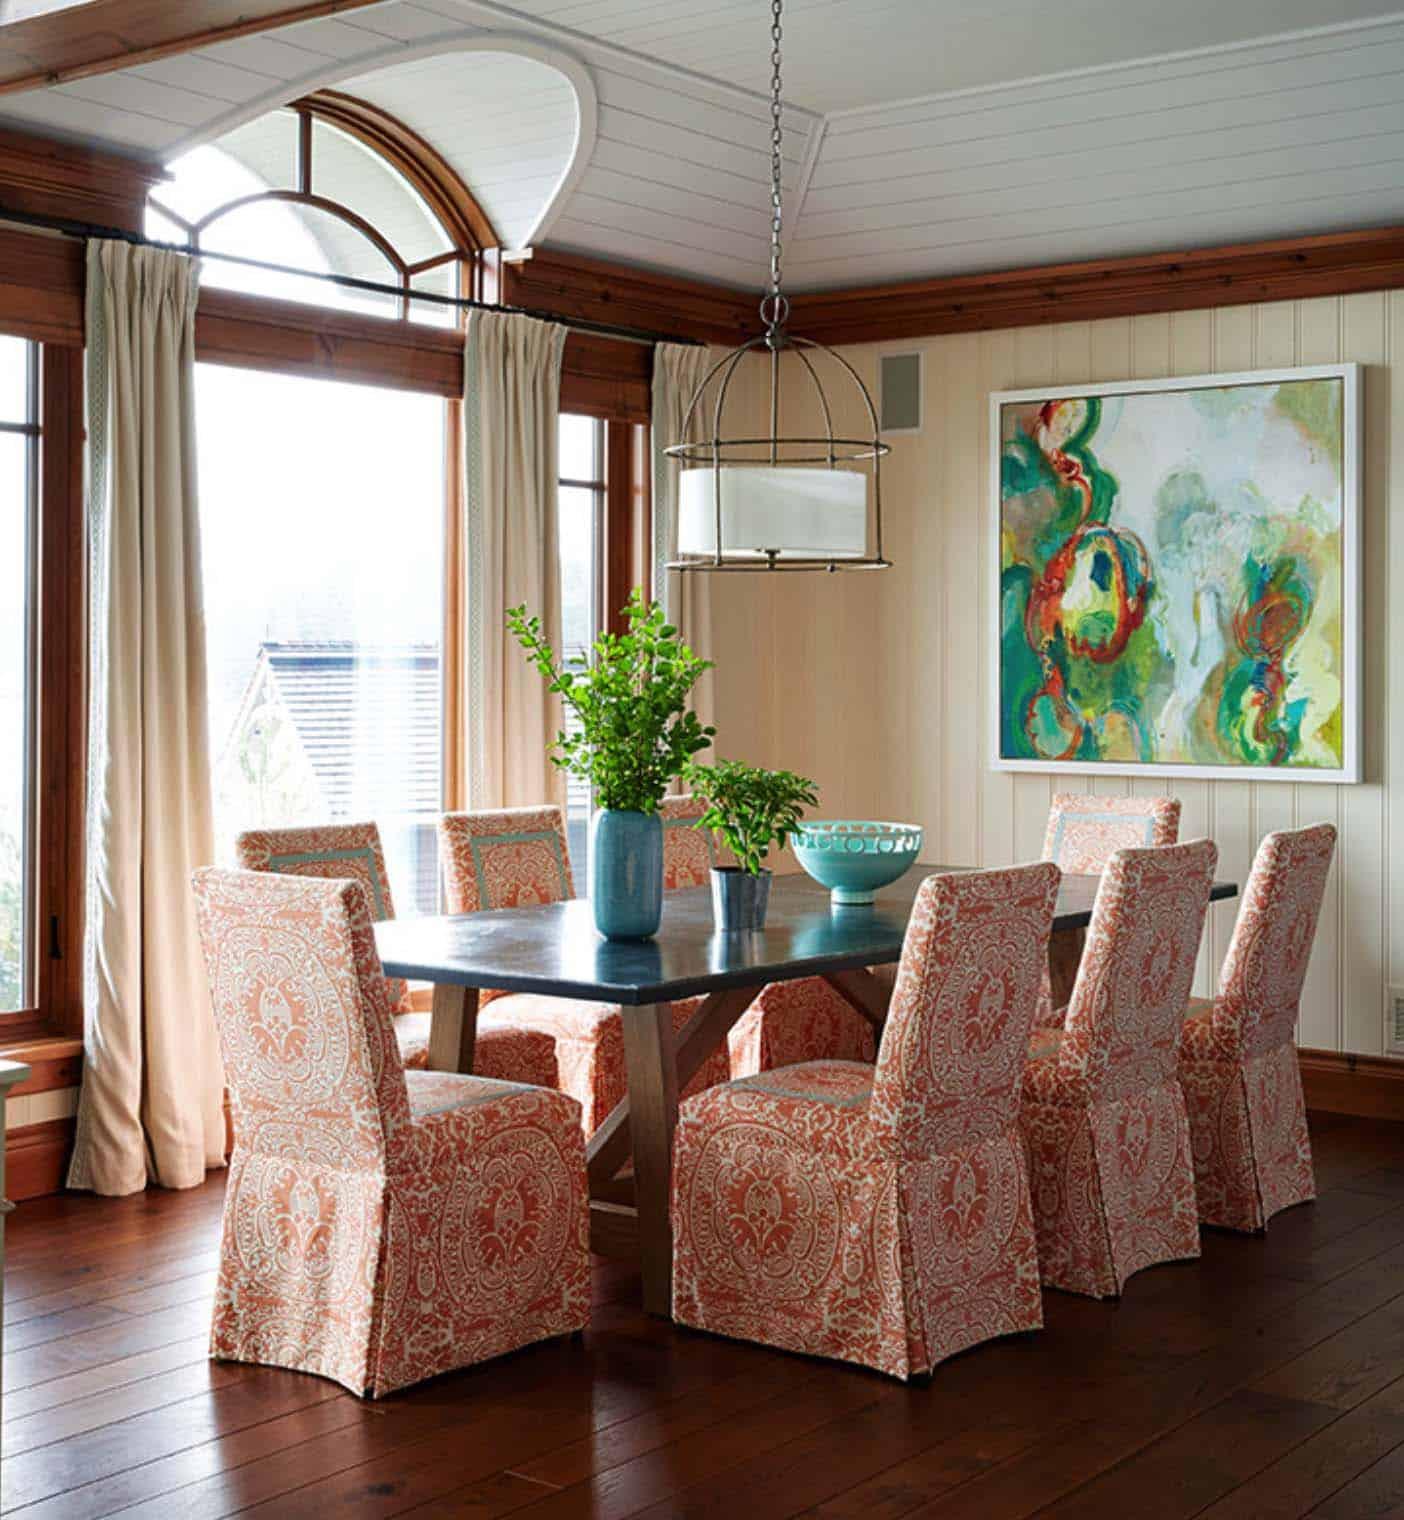 Muskoka Lake House-Anne Hepfer Designs-07-1 Kindesign